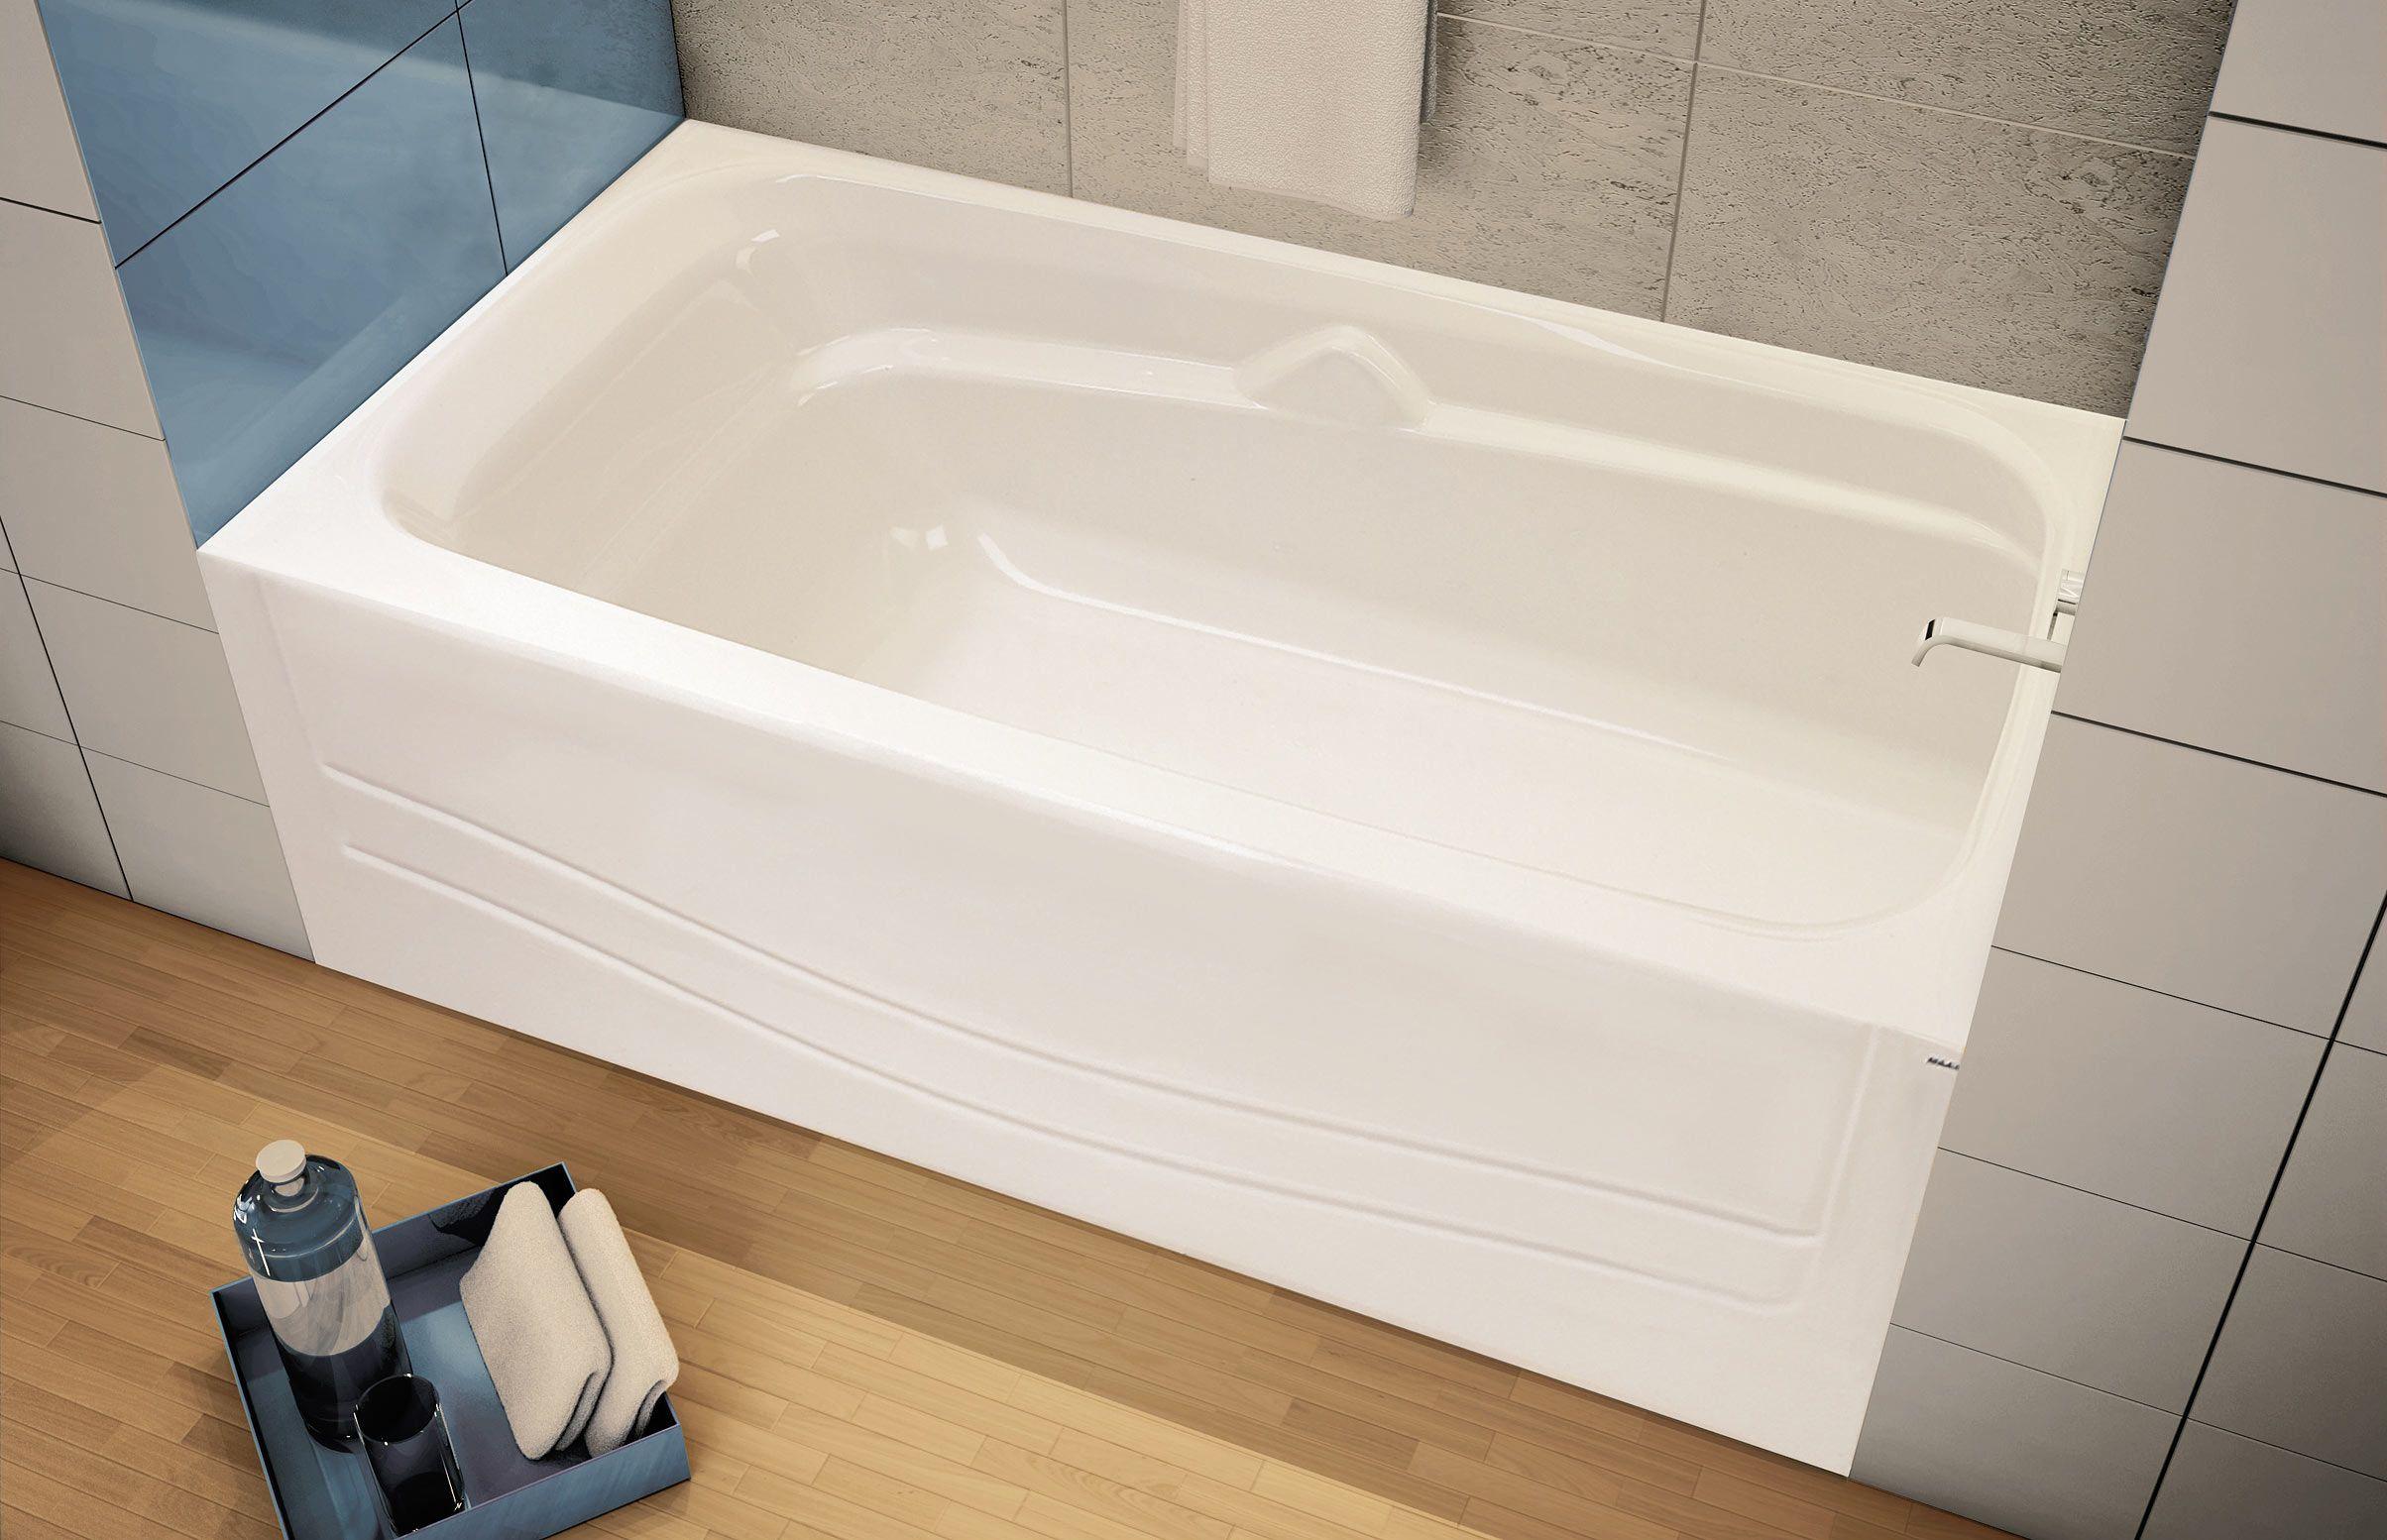 Axial Duo Tub Shield 42 x 58 in. 8 mm | Bathroom 2014 | Pinterest ...